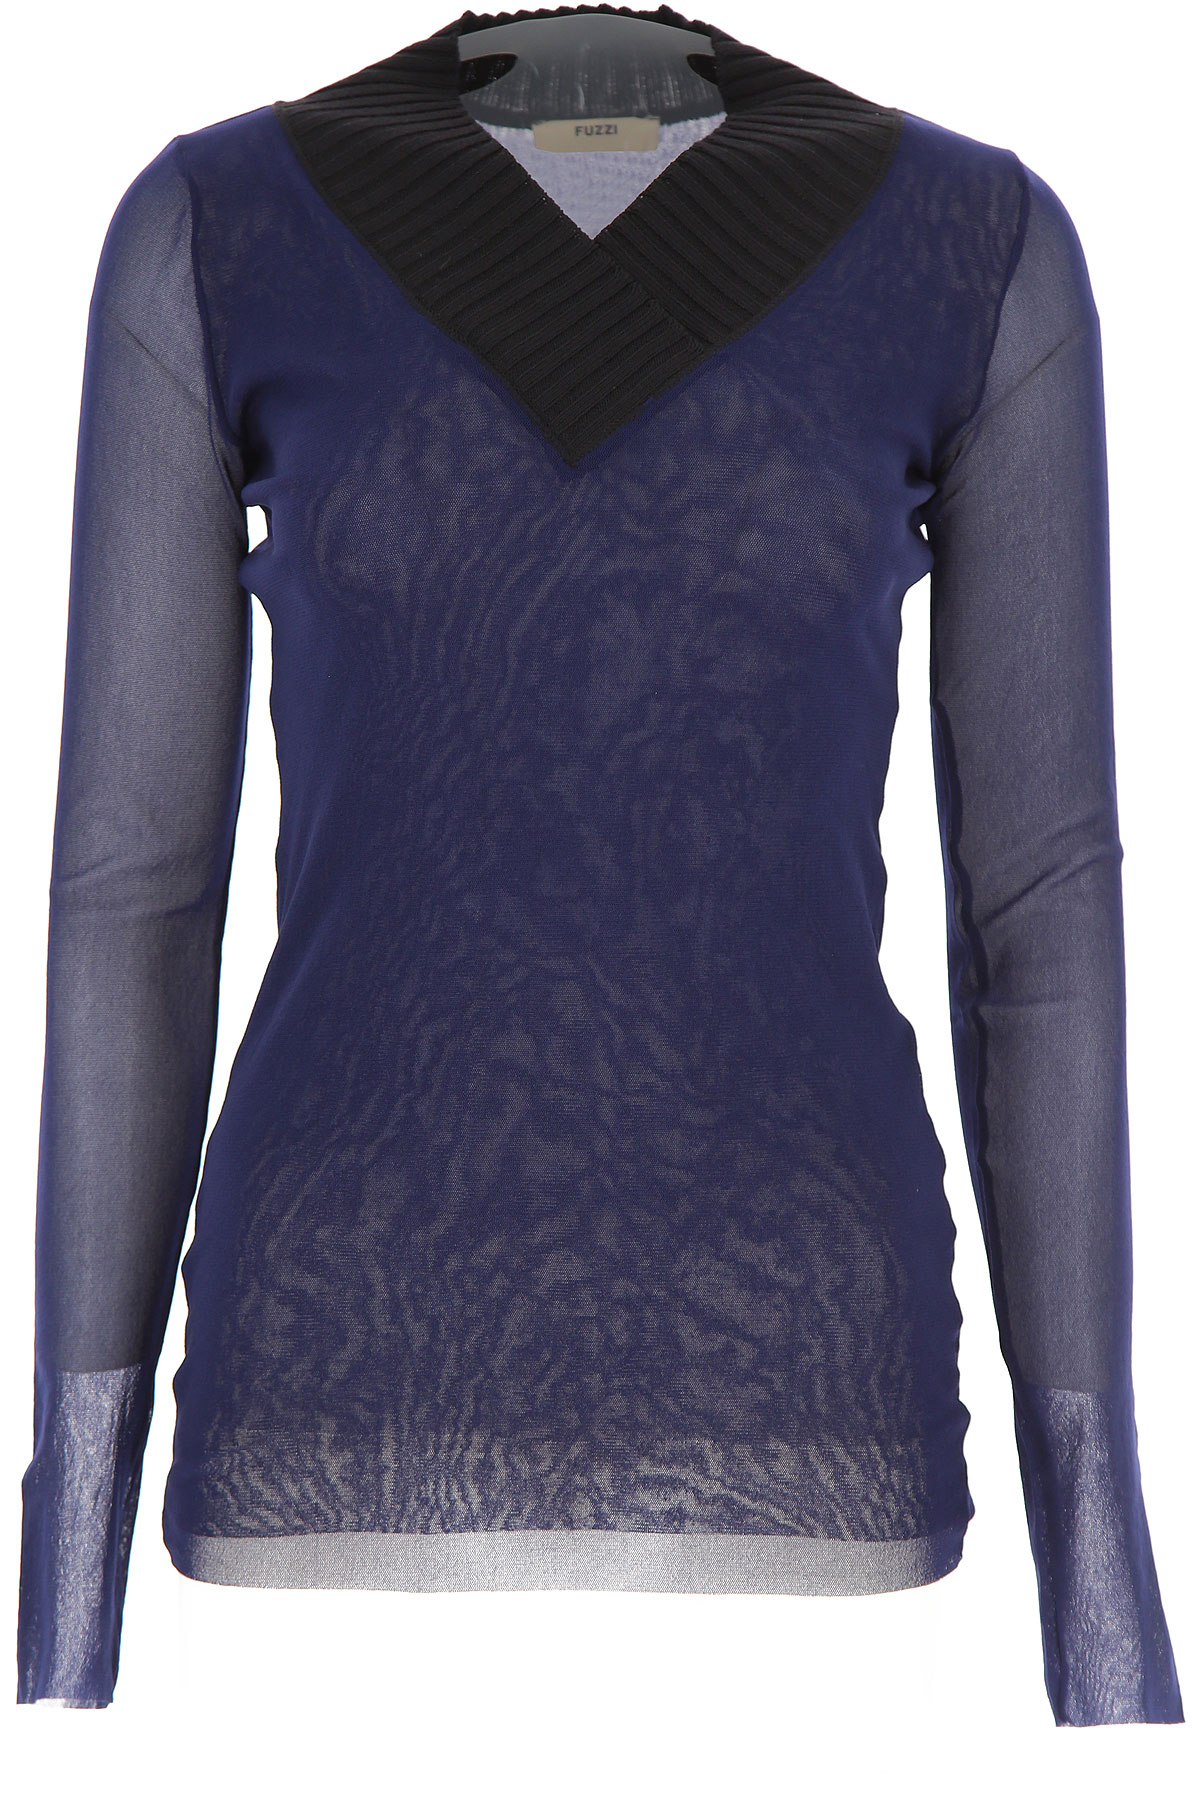 Fuzzi Sweater for Women Jumper On Sale, Midnight Blue, polyamide, 2019, 4 6 8